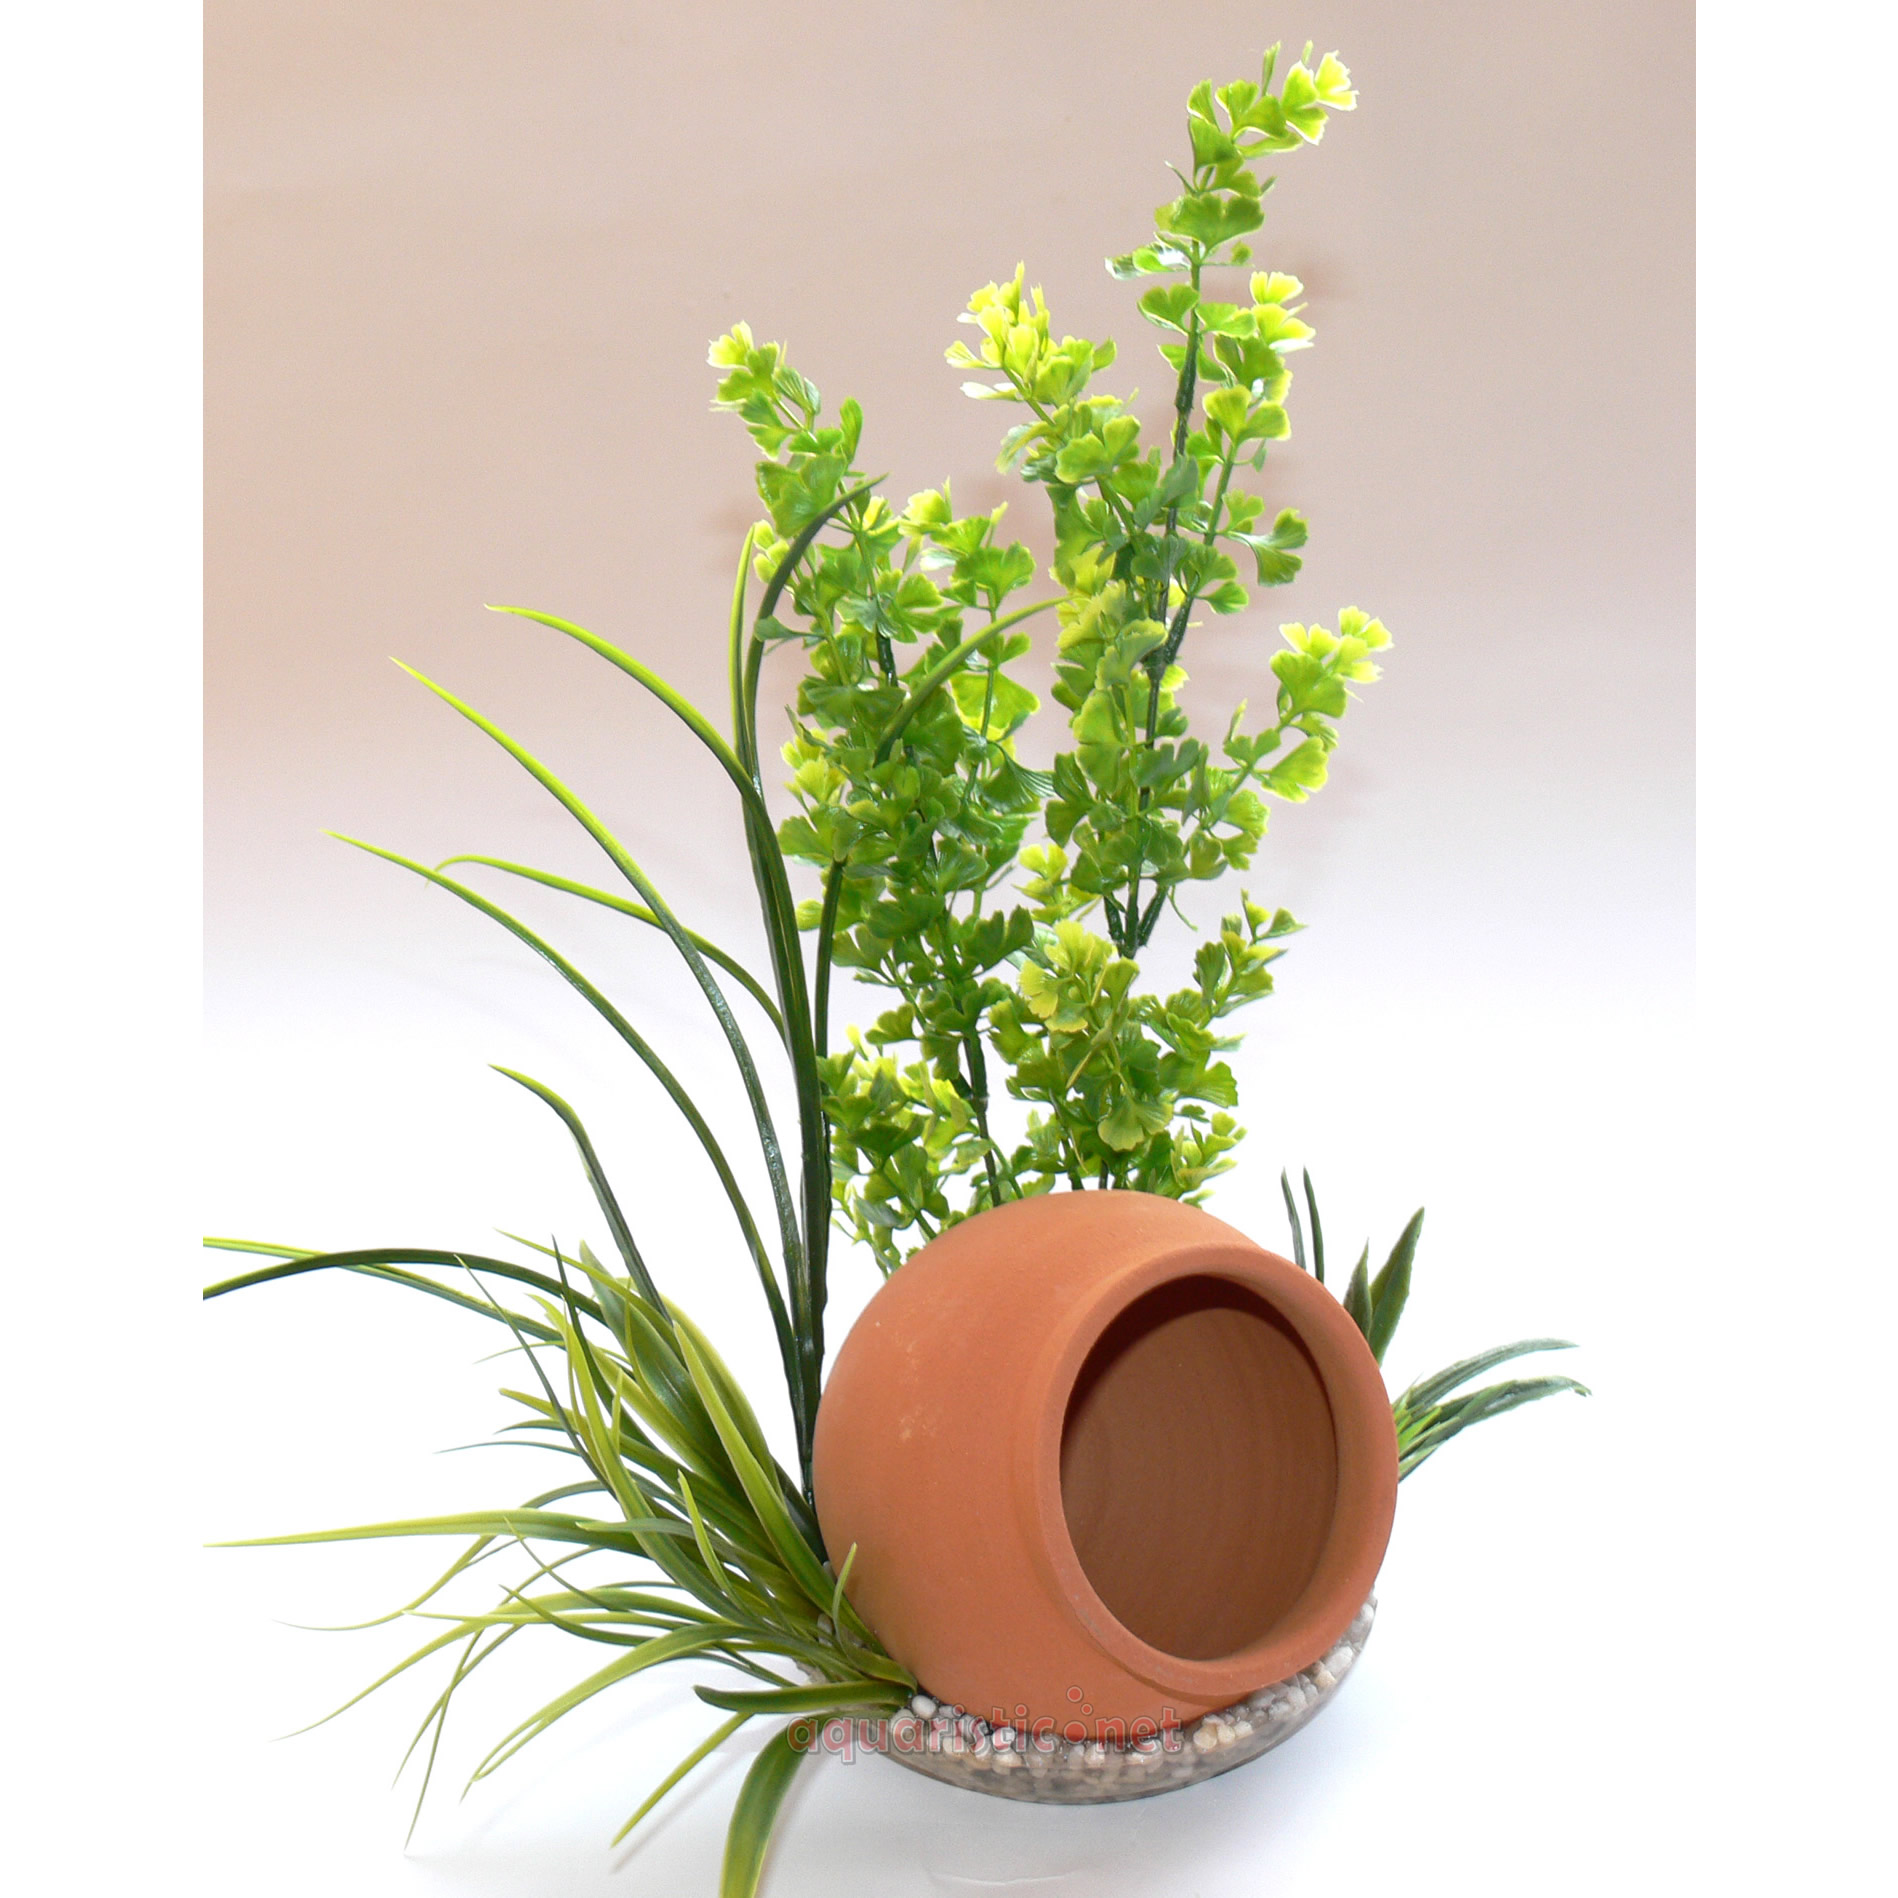 Sydeco Jar Plant, 35 cm hoch